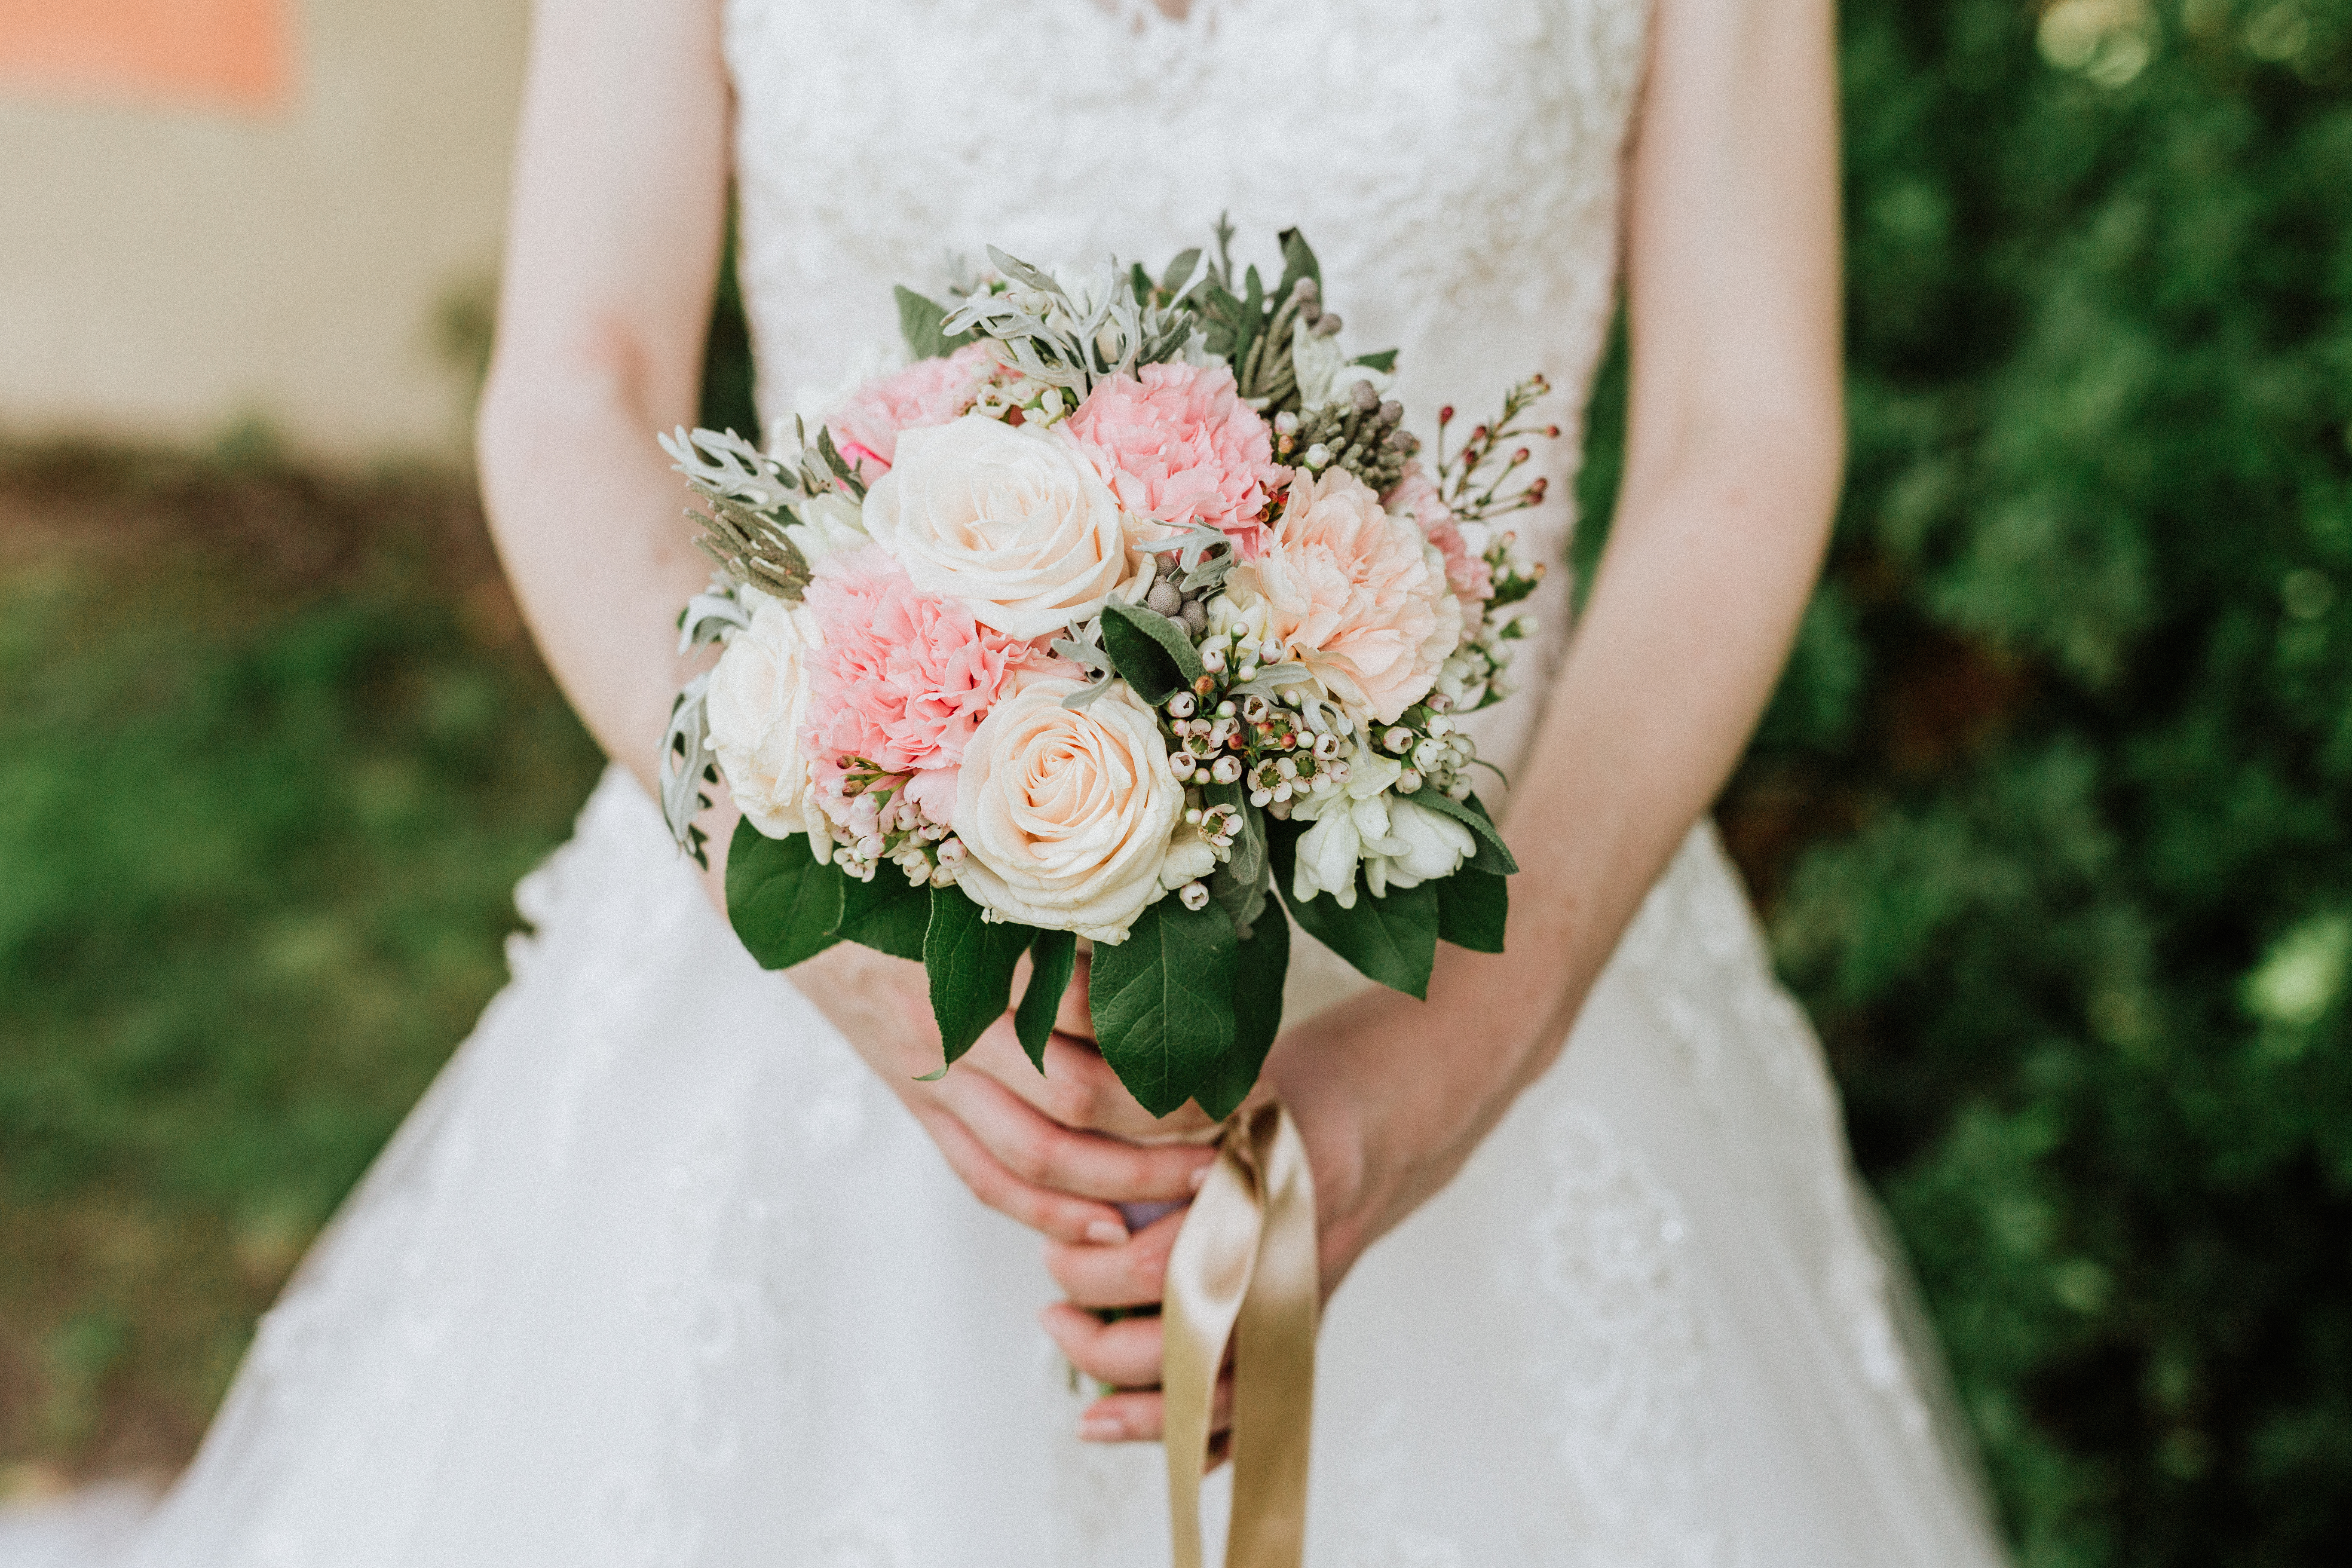 bouquet sposa rose bianche e rosa e dettagli foglie verdi